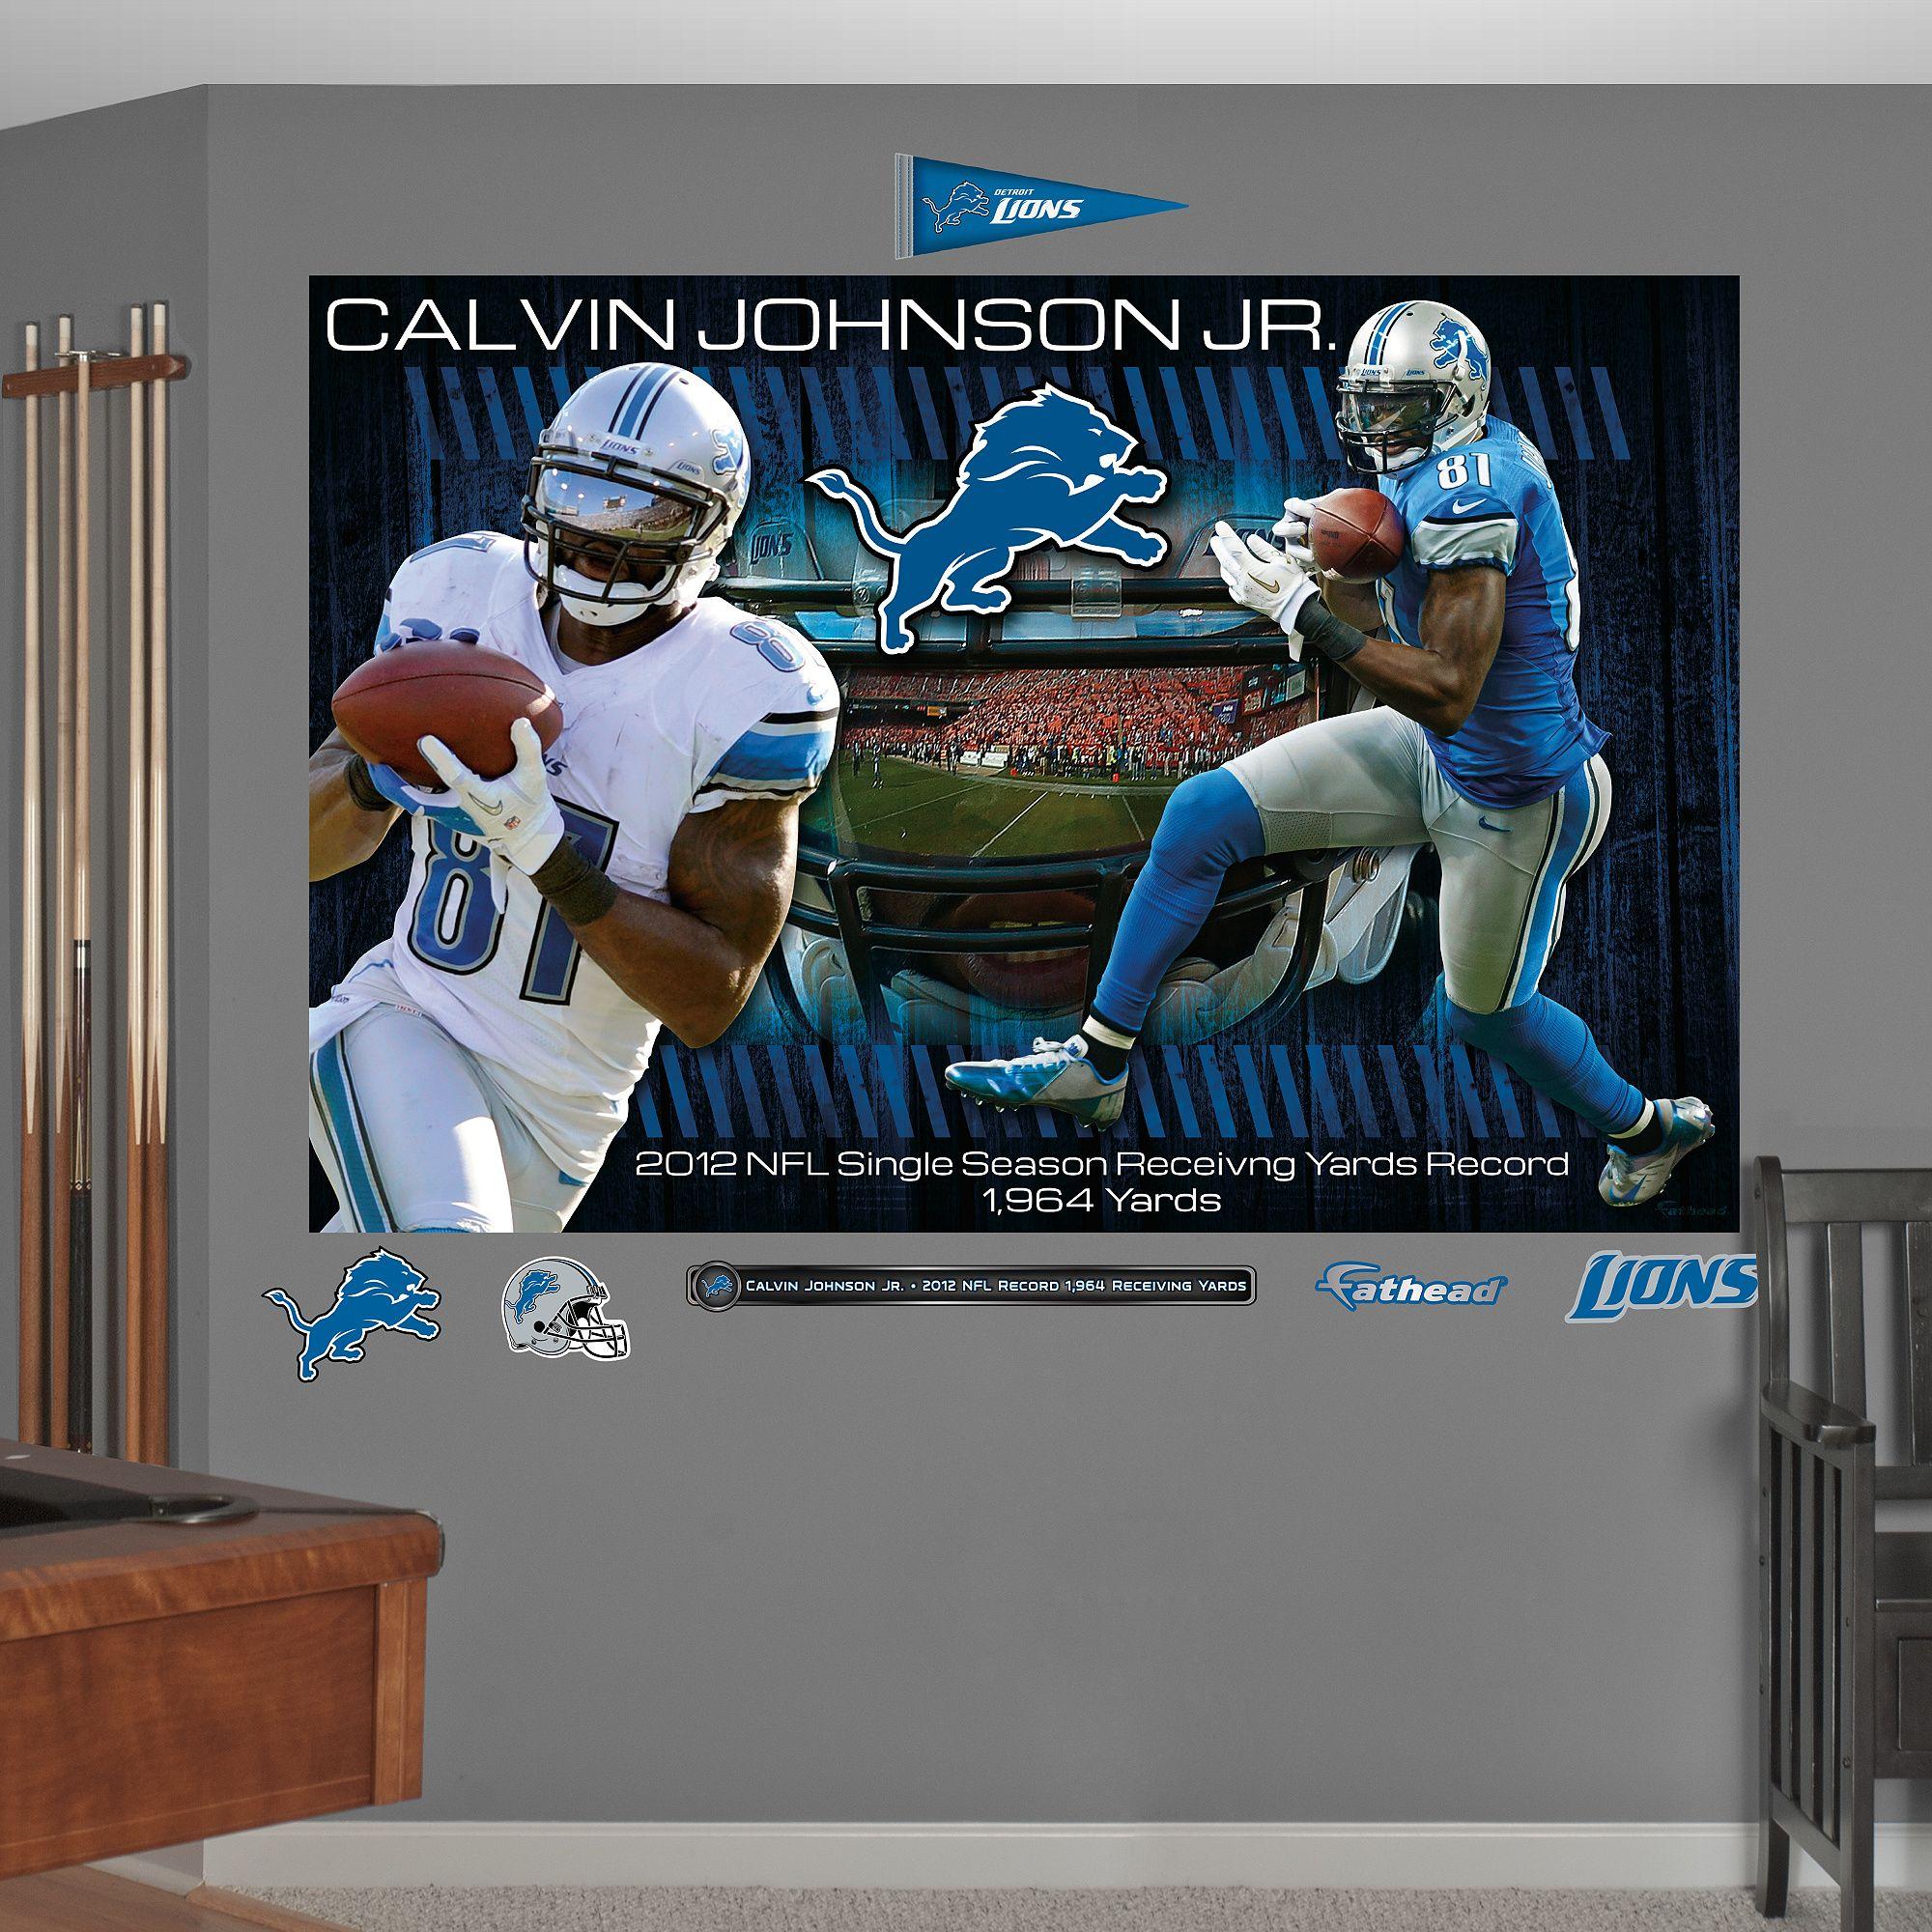 Calvin johnson jr 2012 receiving yards record mural